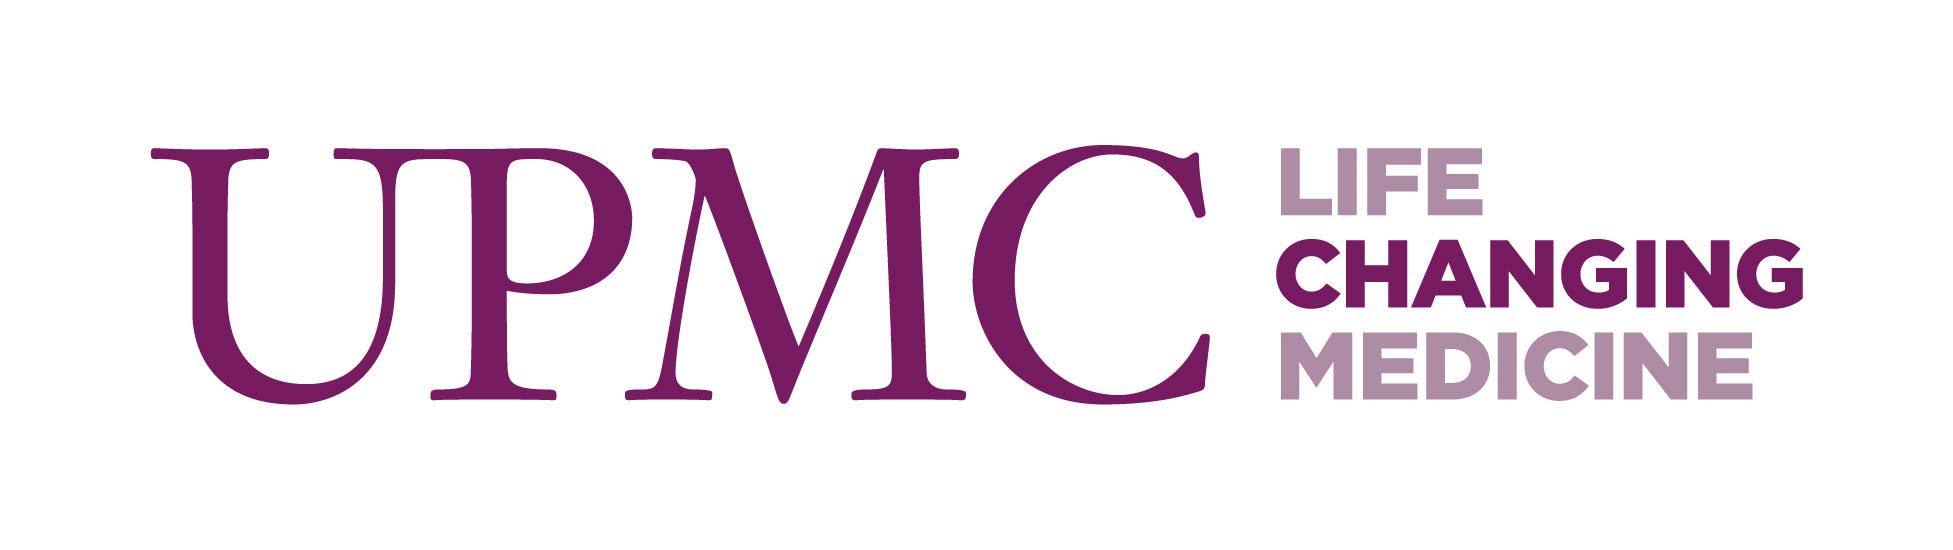 UPMC Pathology - VoiceOver CoPath Speech Recognition